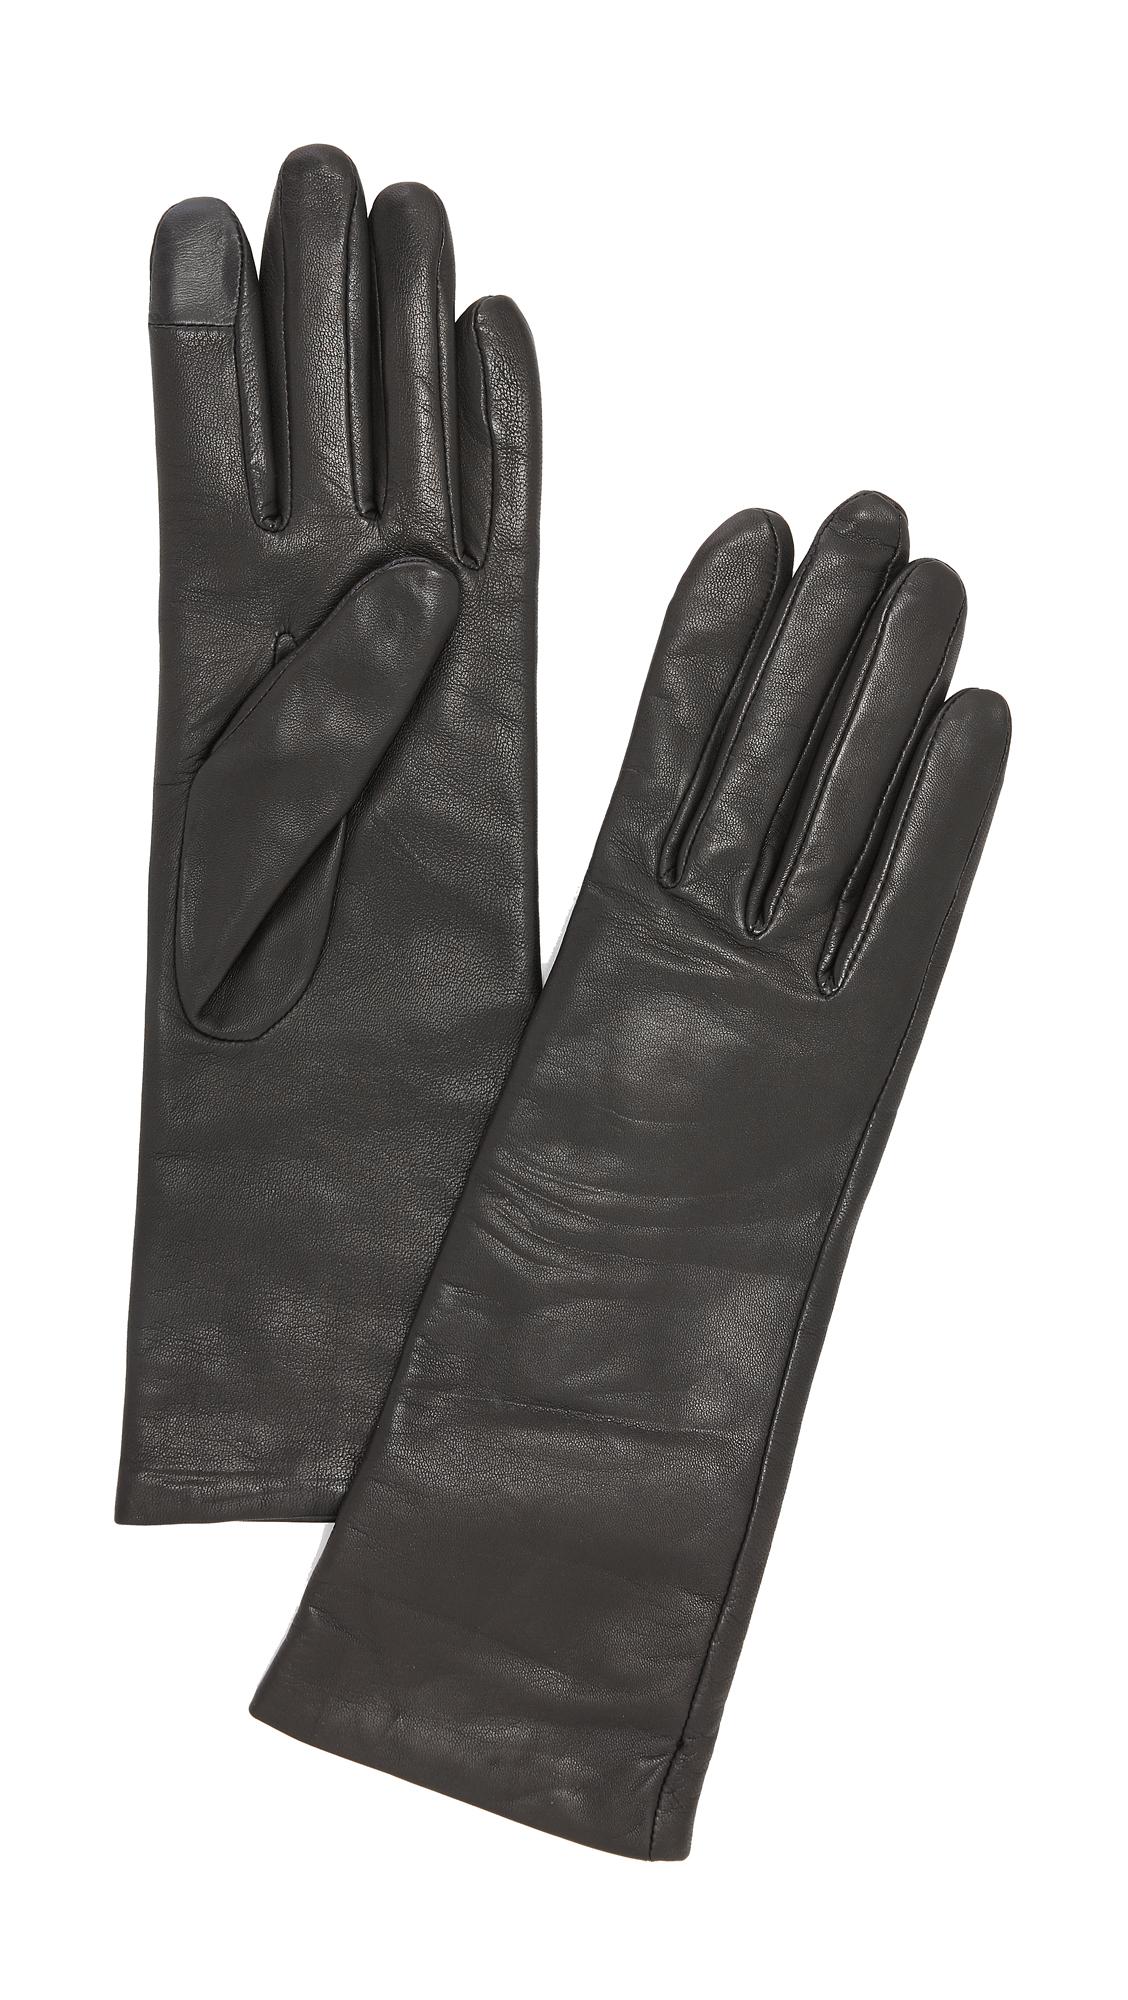 Agnelle Christina Leather Texting Gloves - Black